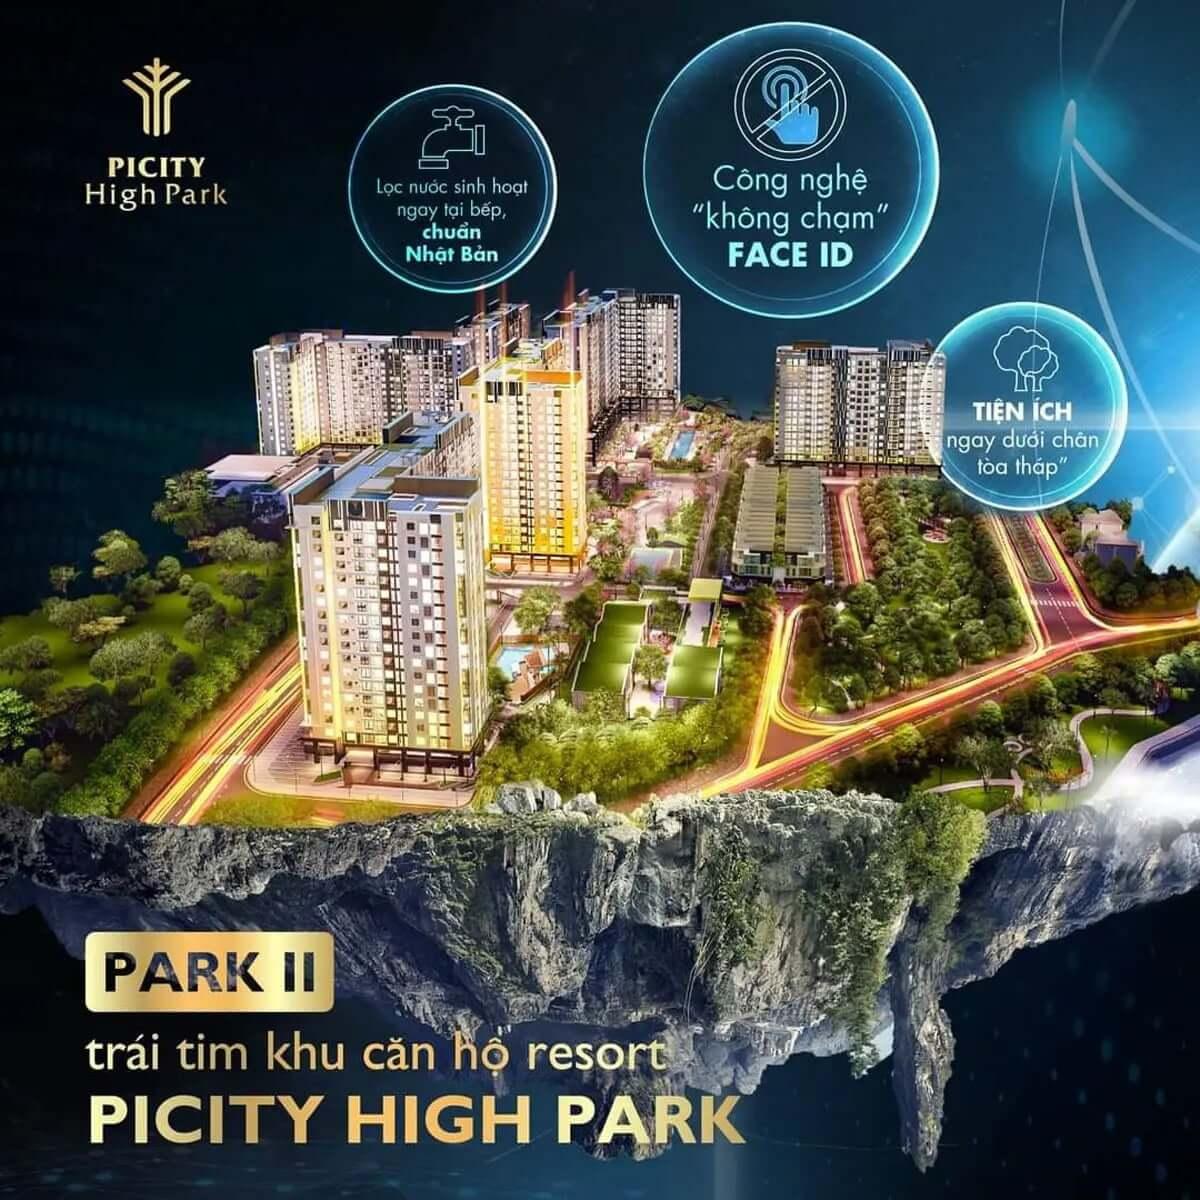 Tầm nhìn dự án Picity High Park